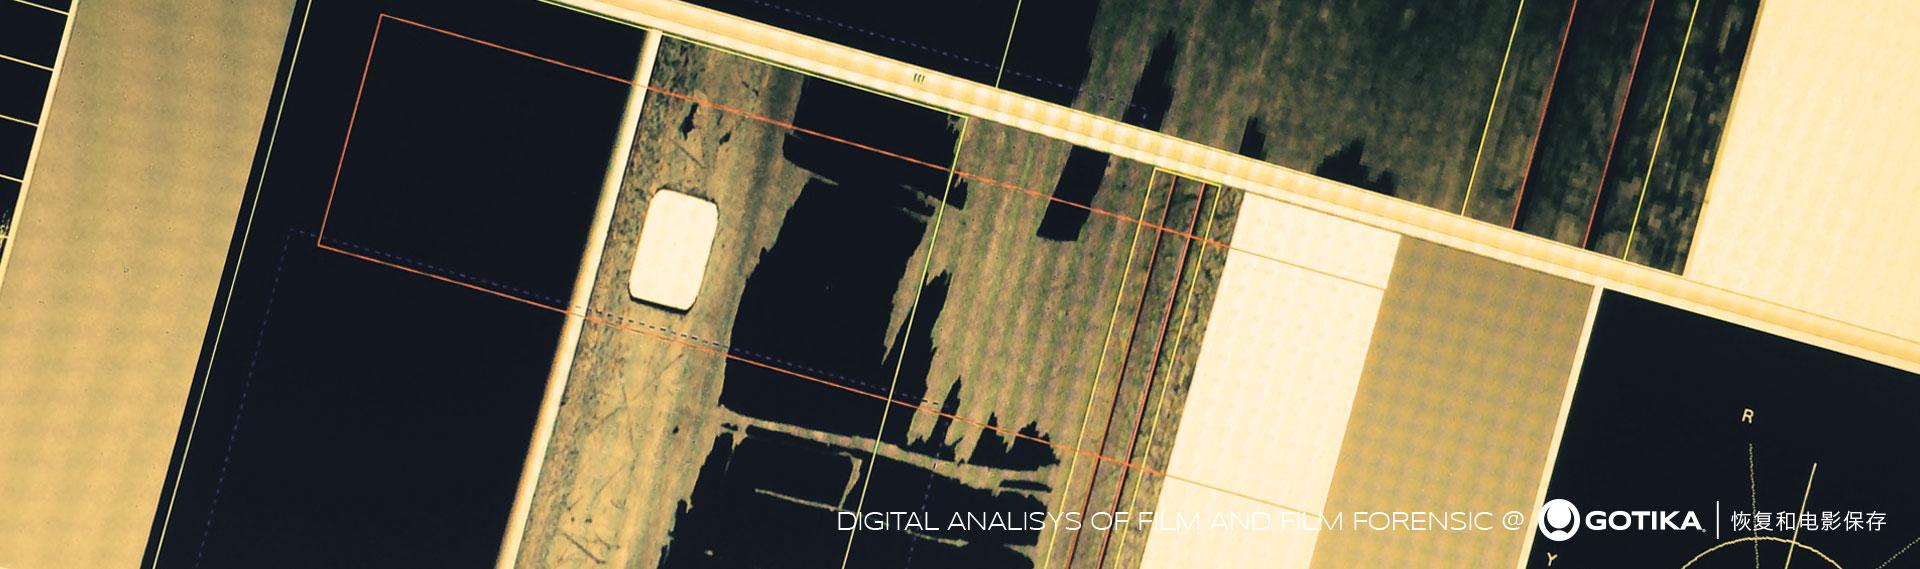 814-photo-collage-preservation-06.jpg